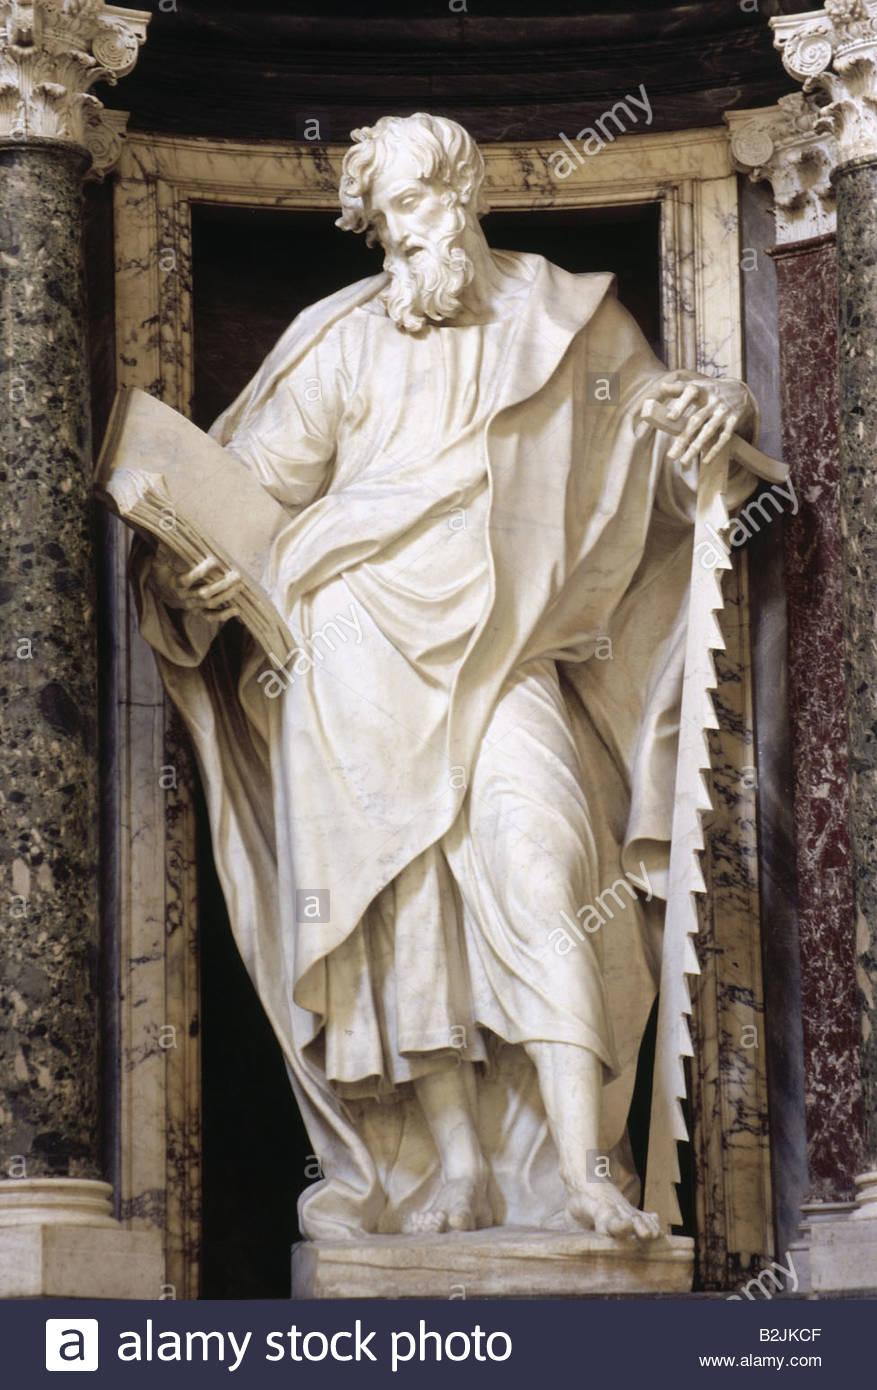 simon-the-zealot-apostle-statue-at-the-basilica-of-st-john-lateran-B2JKCF